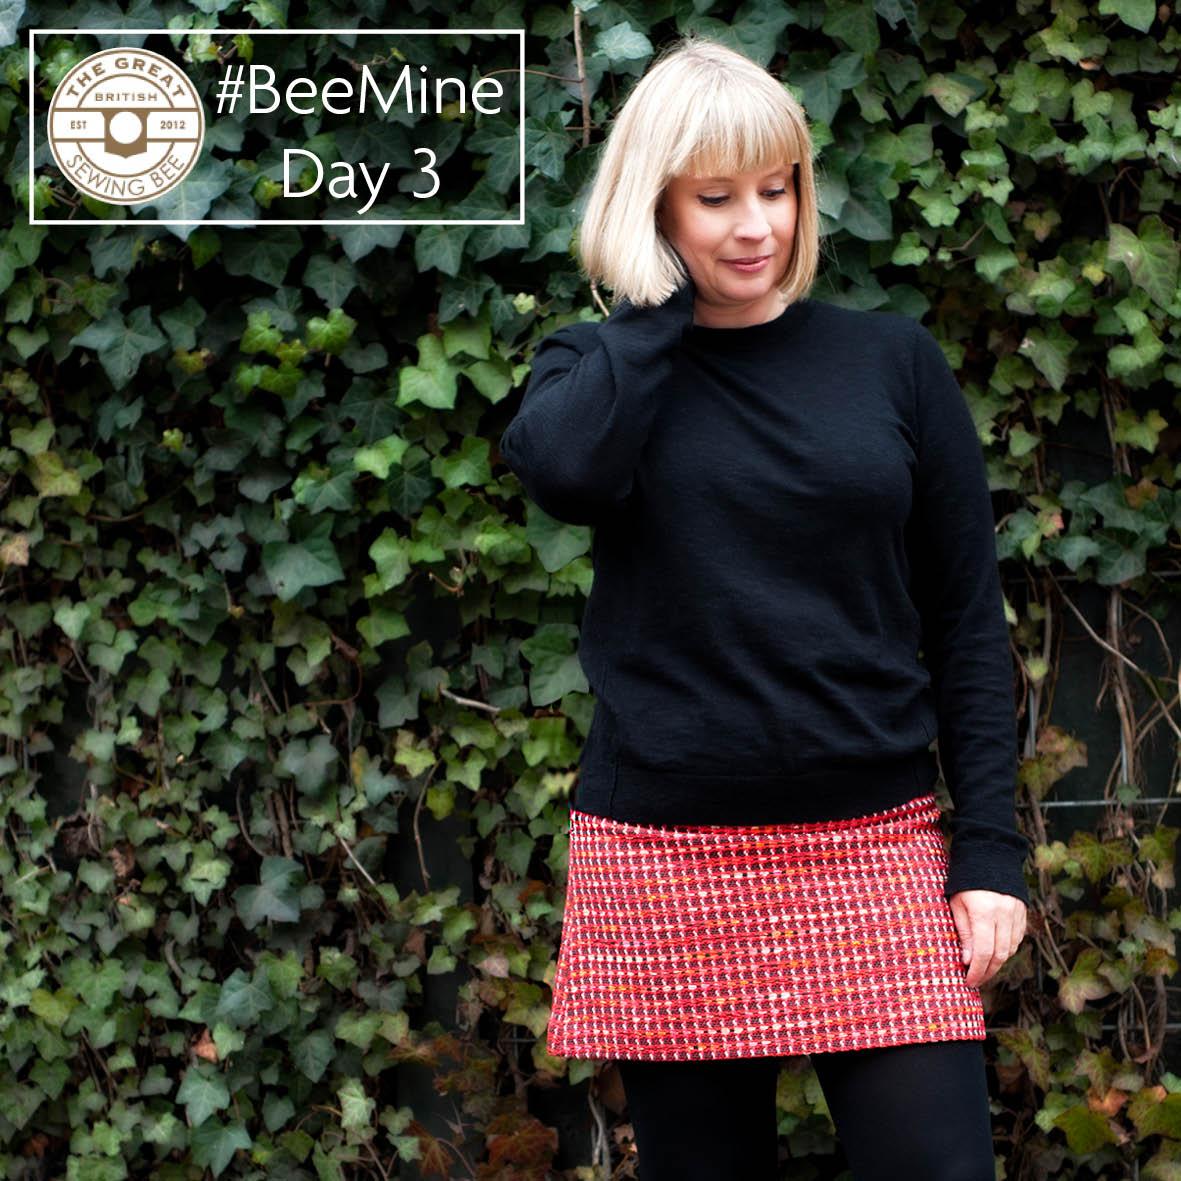 Day 3 #BeeMine- my 30 day blog challenge